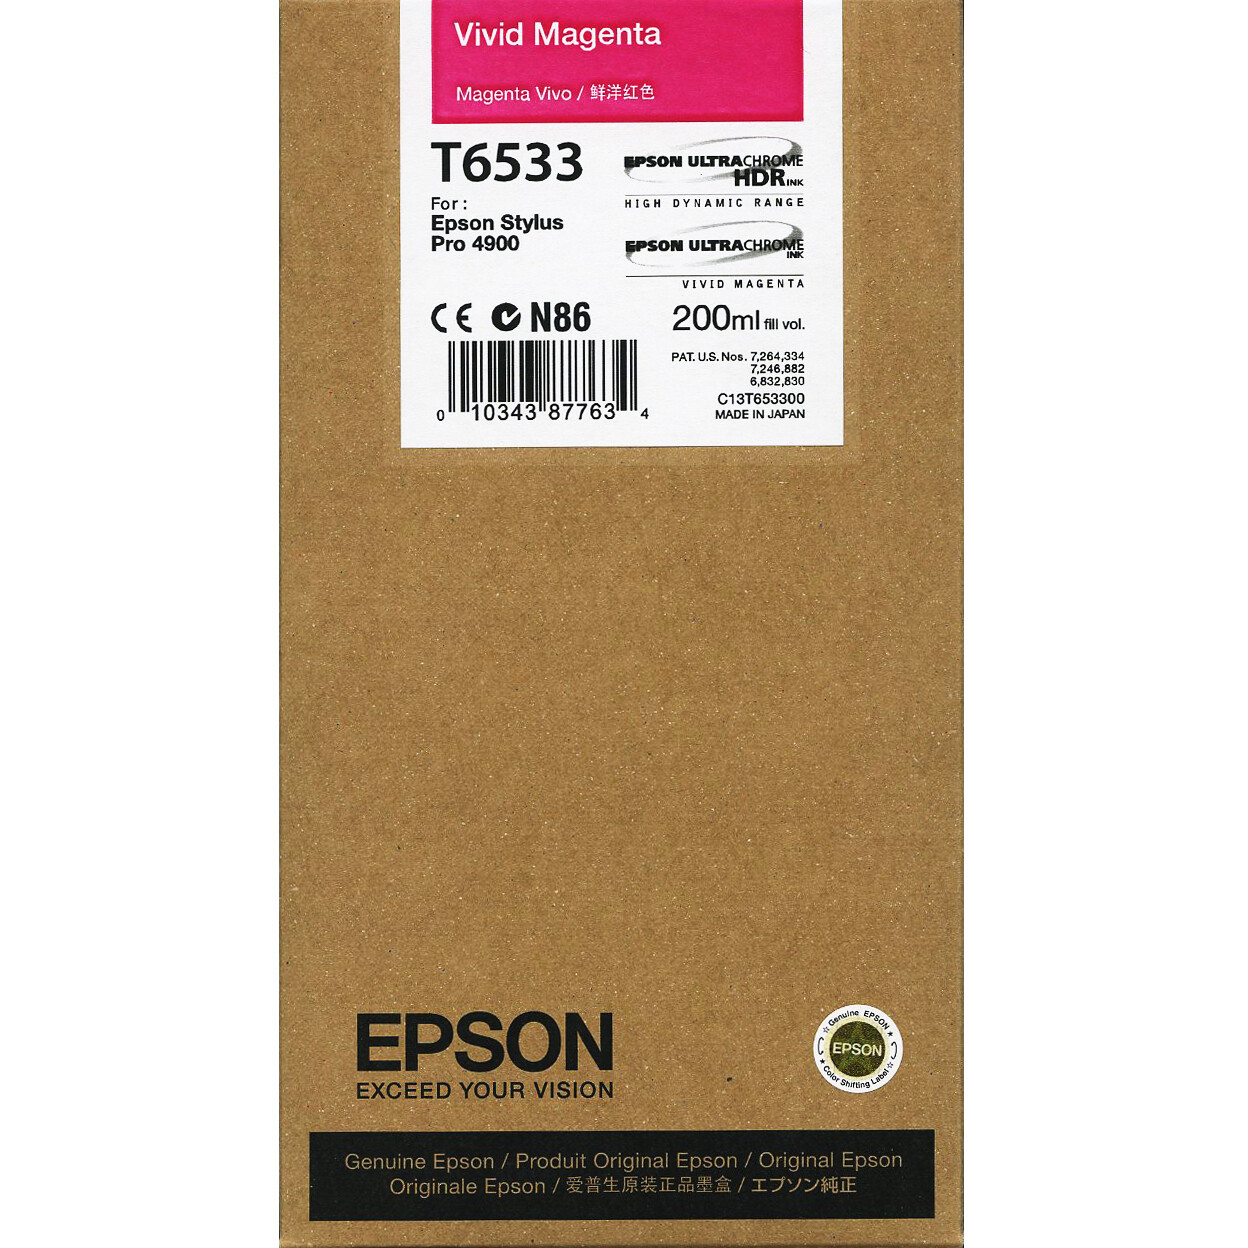 Epson T6533 Vivid Ink Cartridge, Magenta, 200ml